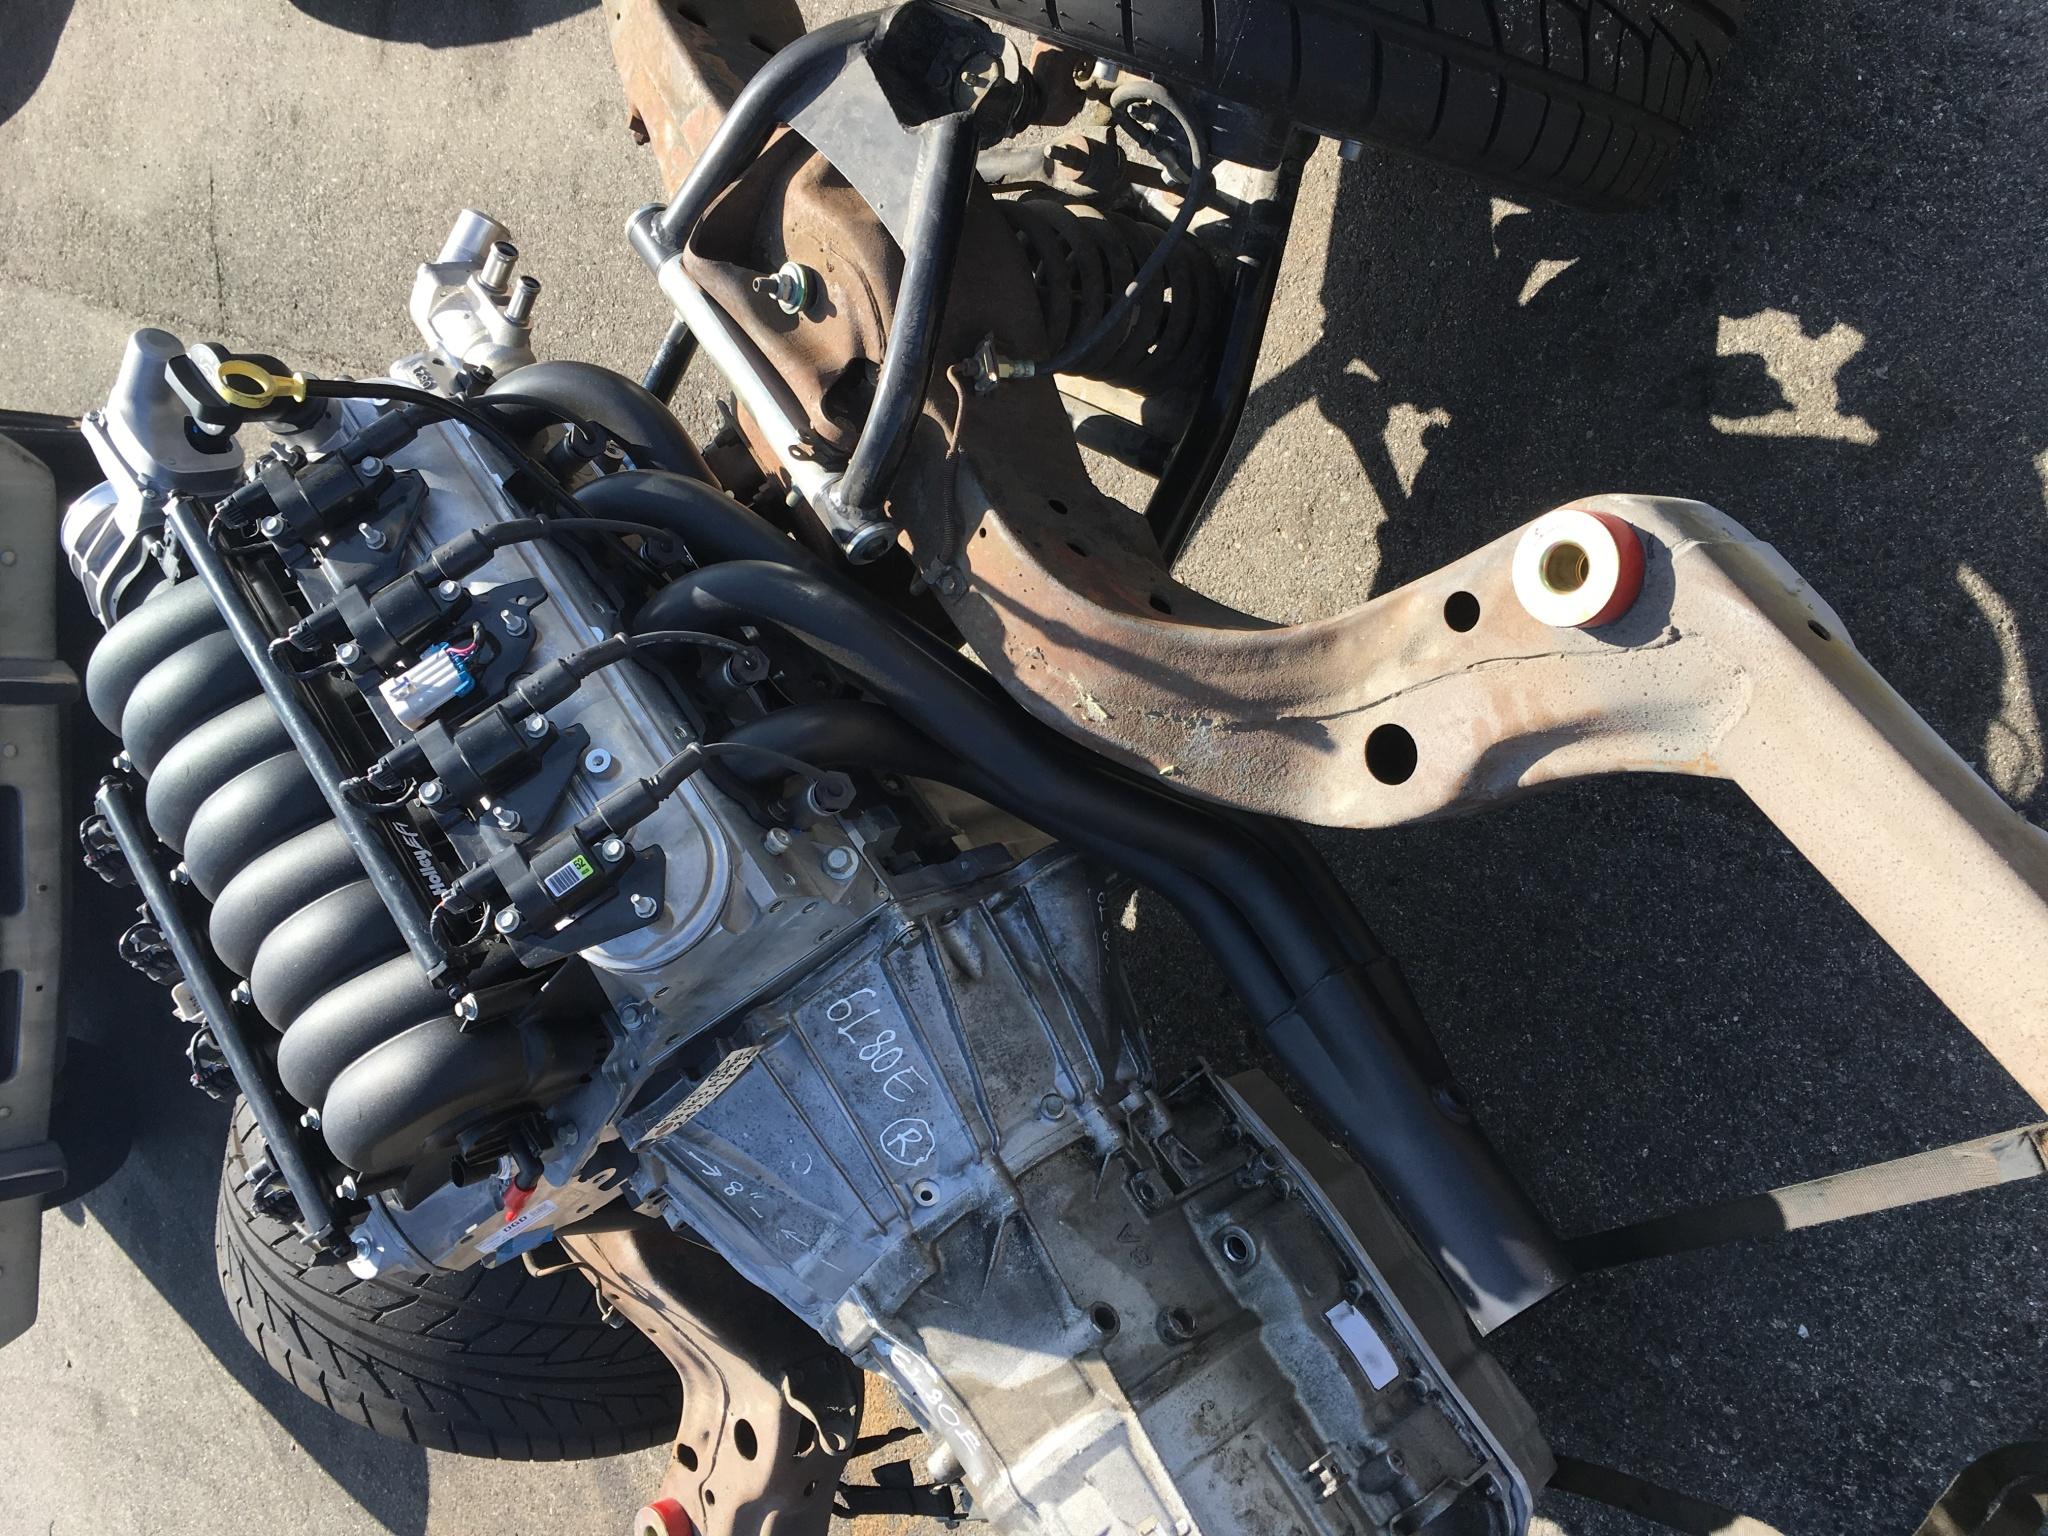 68-72 chevelle full pro touring suspension kit